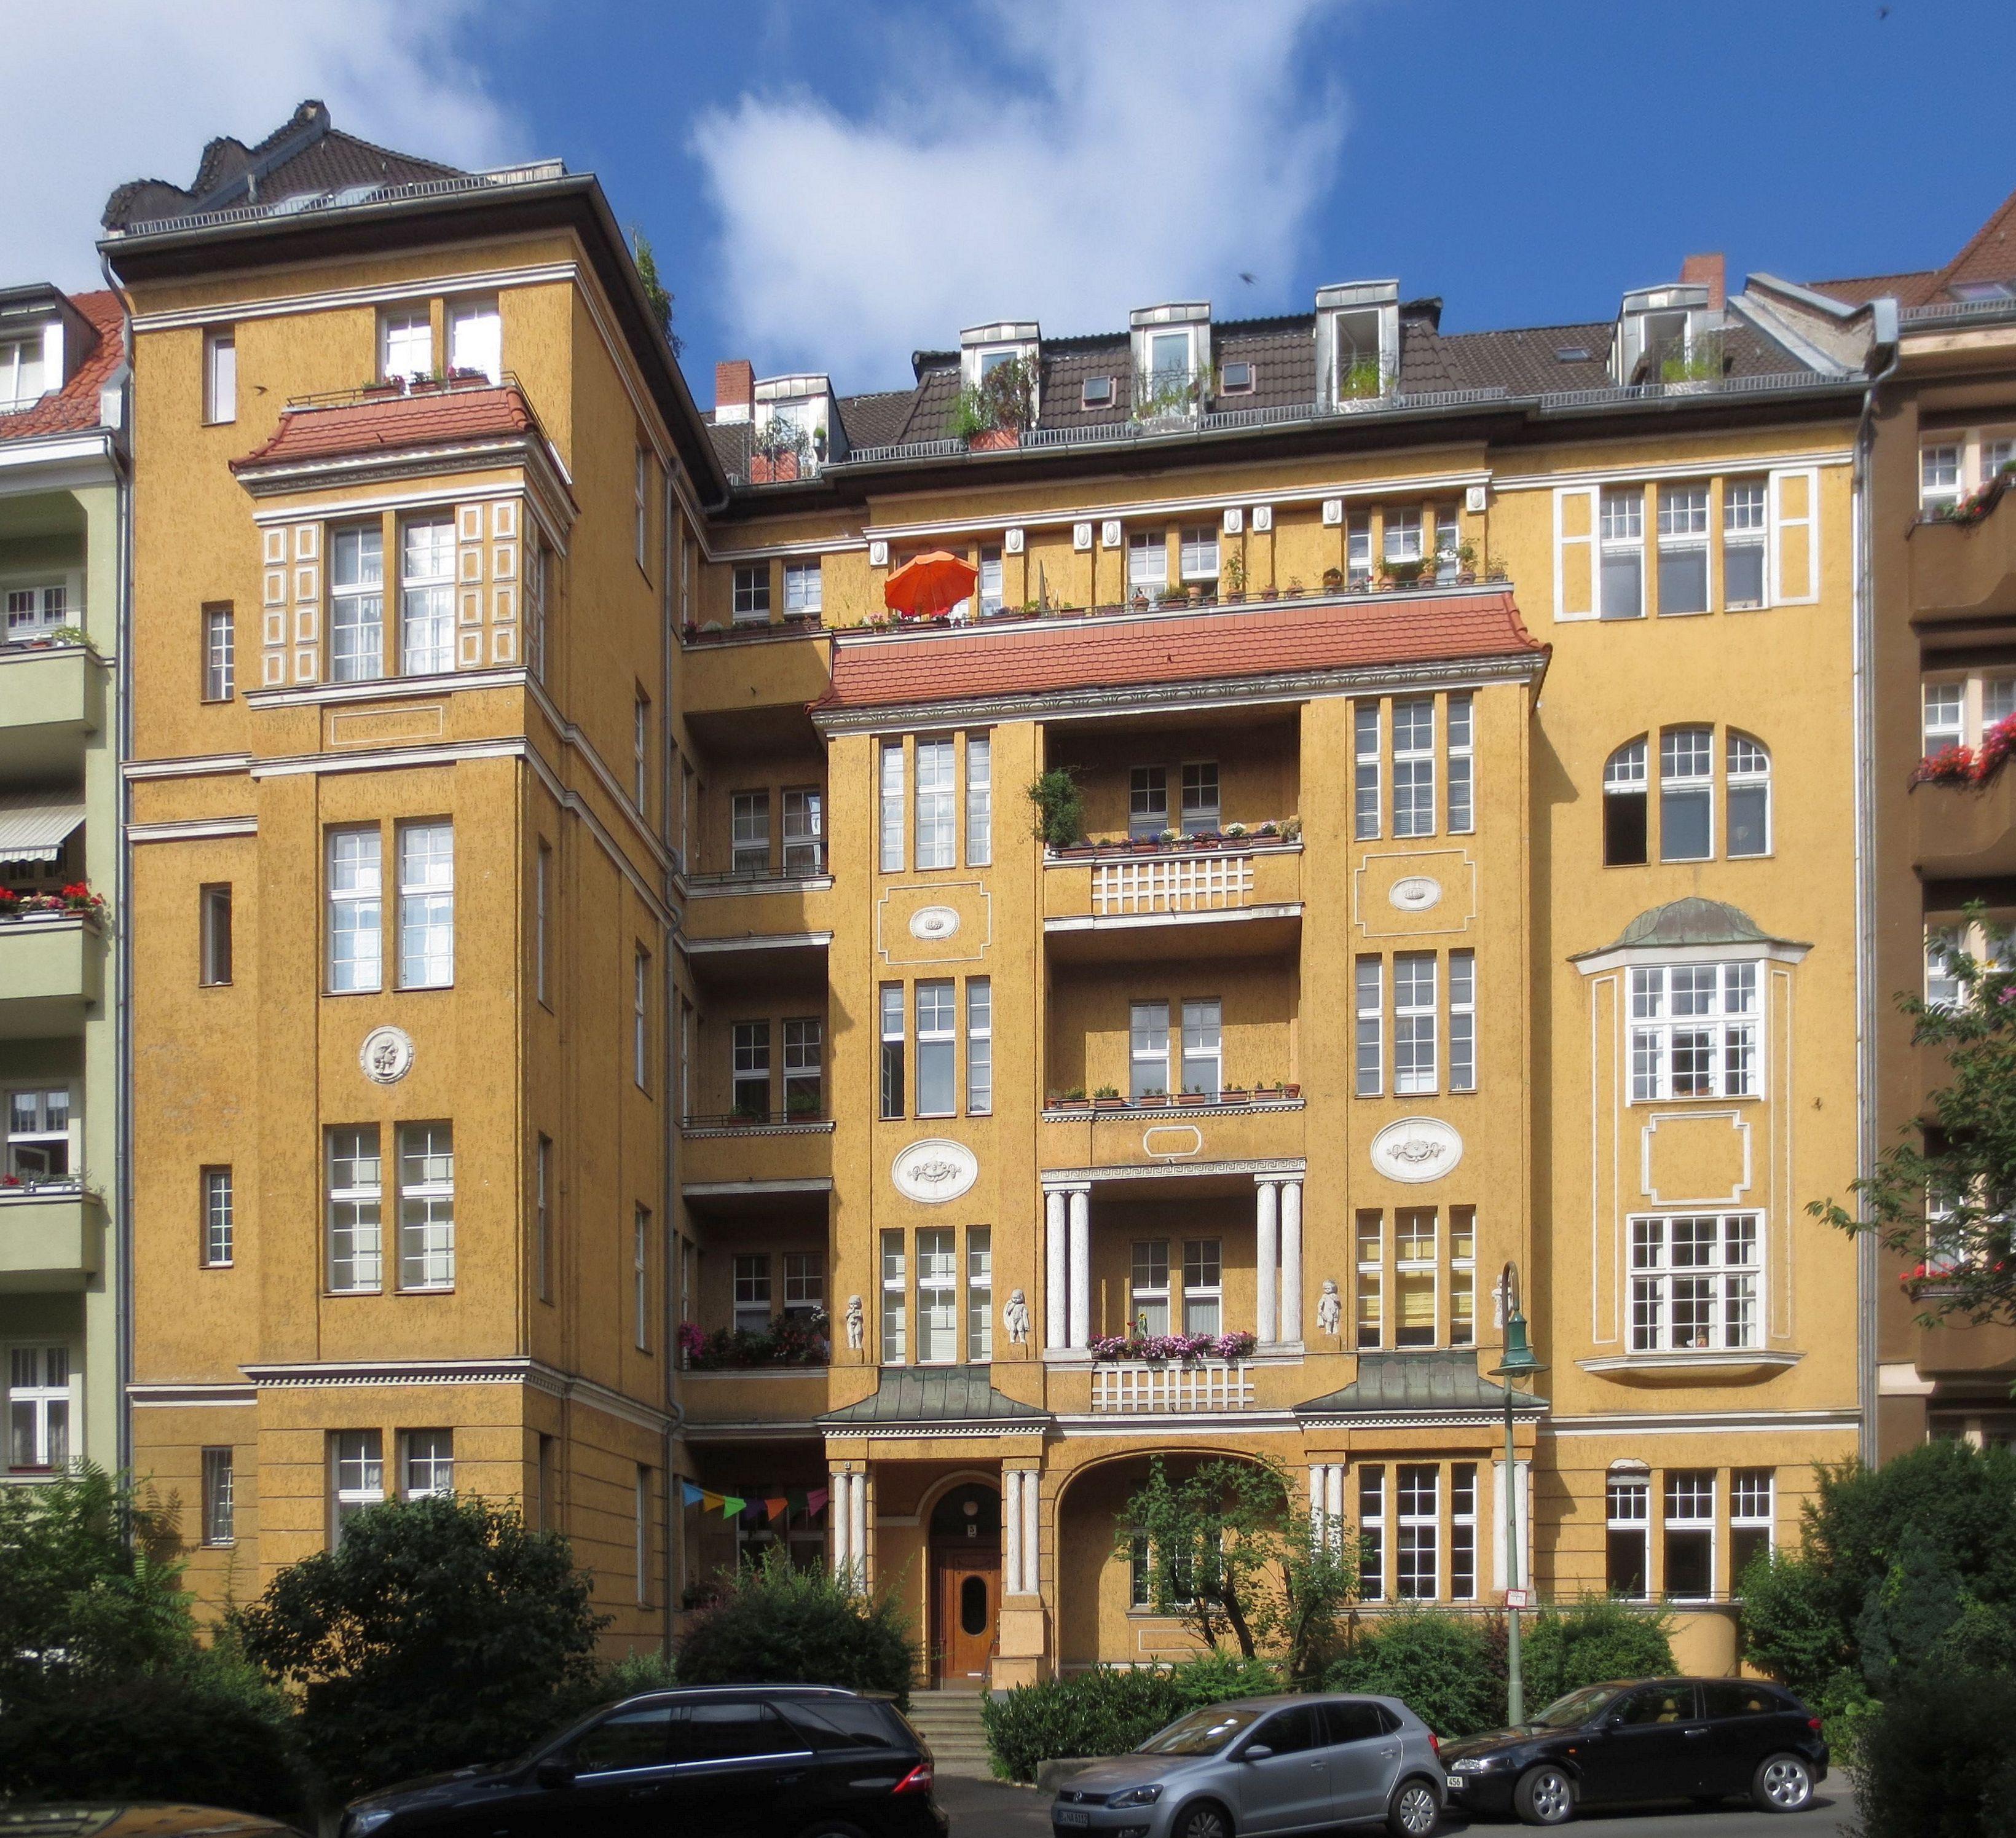 file berlin schoeneberg hewaldstrasse 5 wikimedia commons. Black Bedroom Furniture Sets. Home Design Ideas